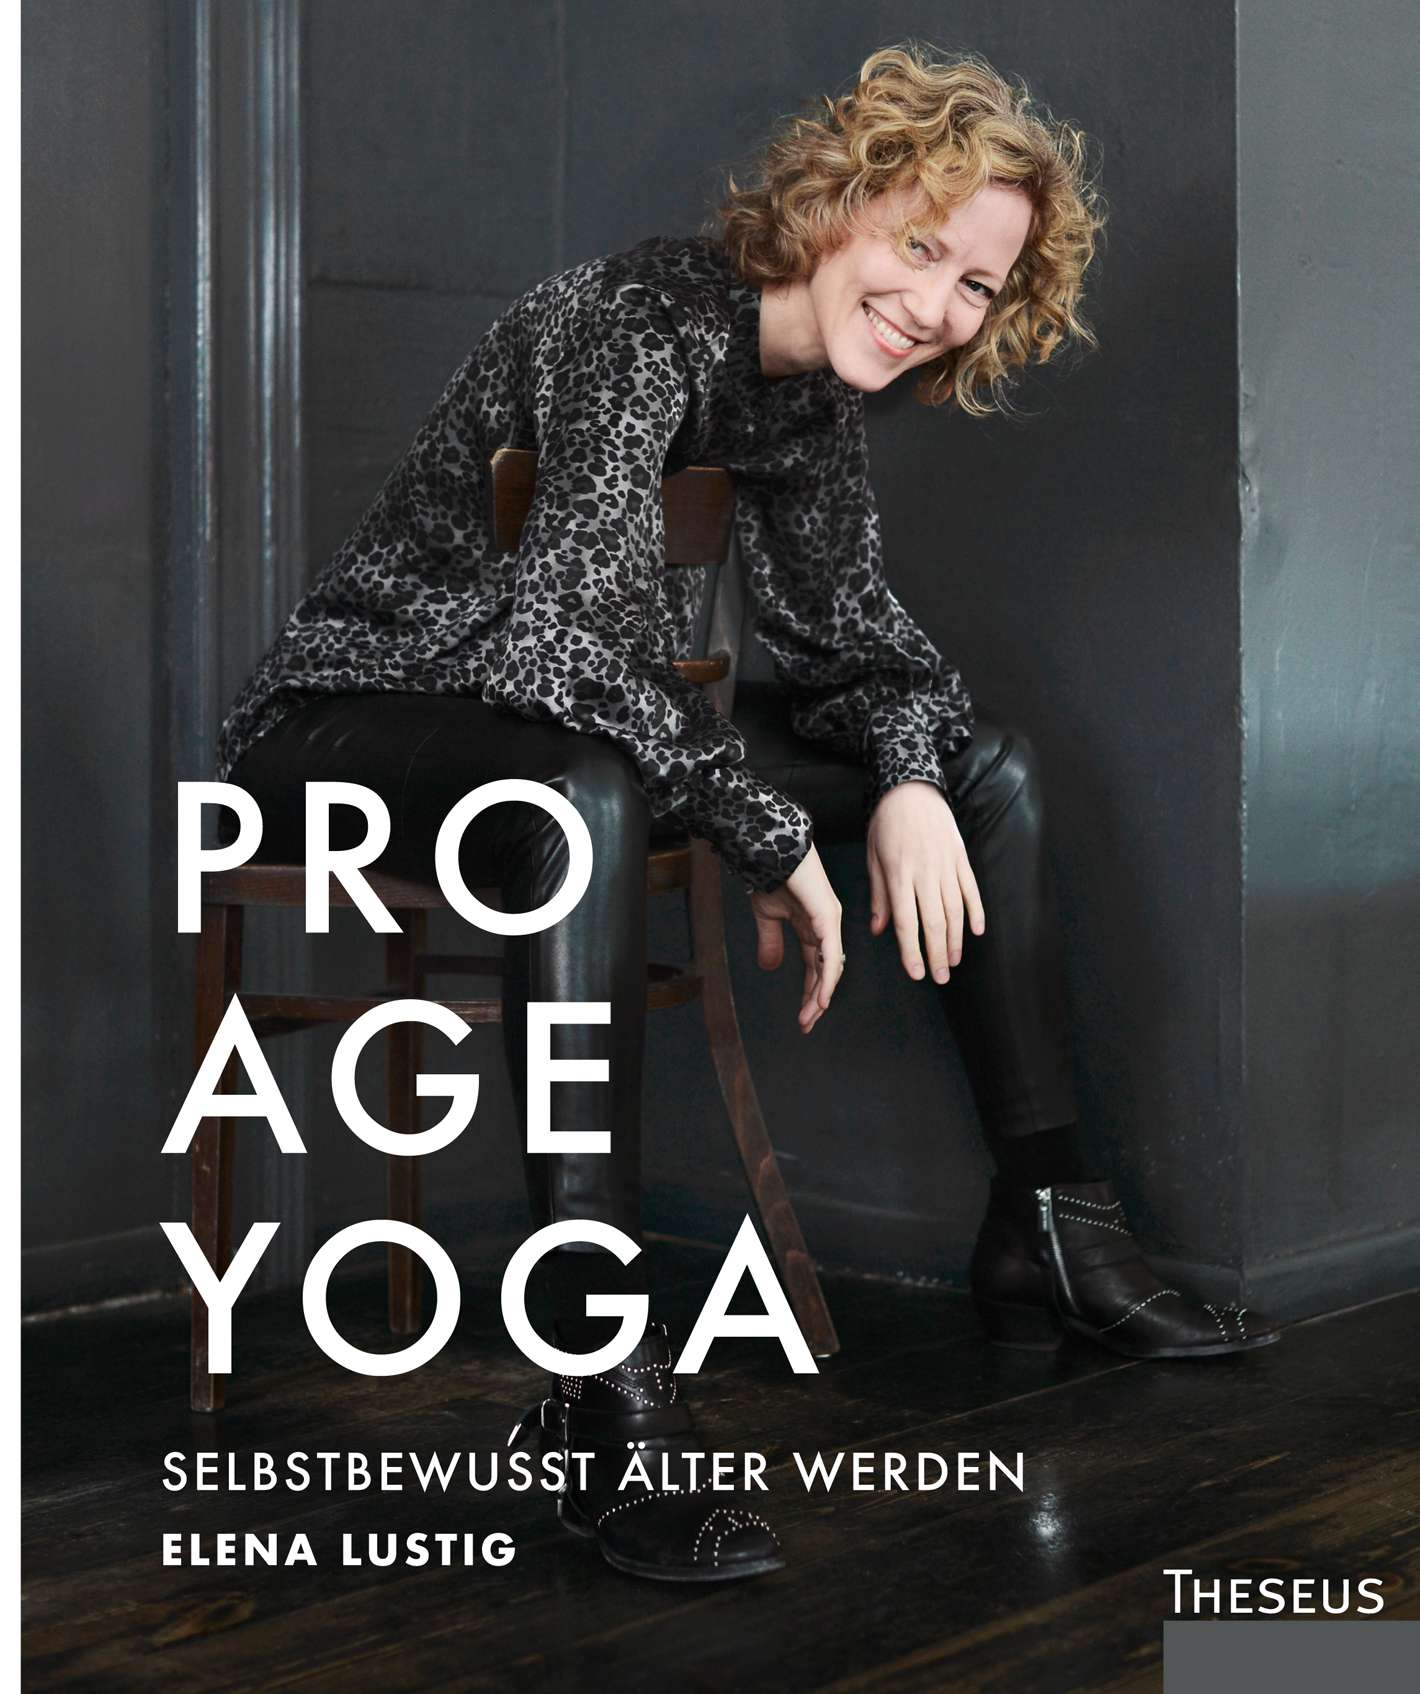 """Pro Age Yoga"" von Elena Lustig © Theseus/Kamphausen Yogannetteblog.de"